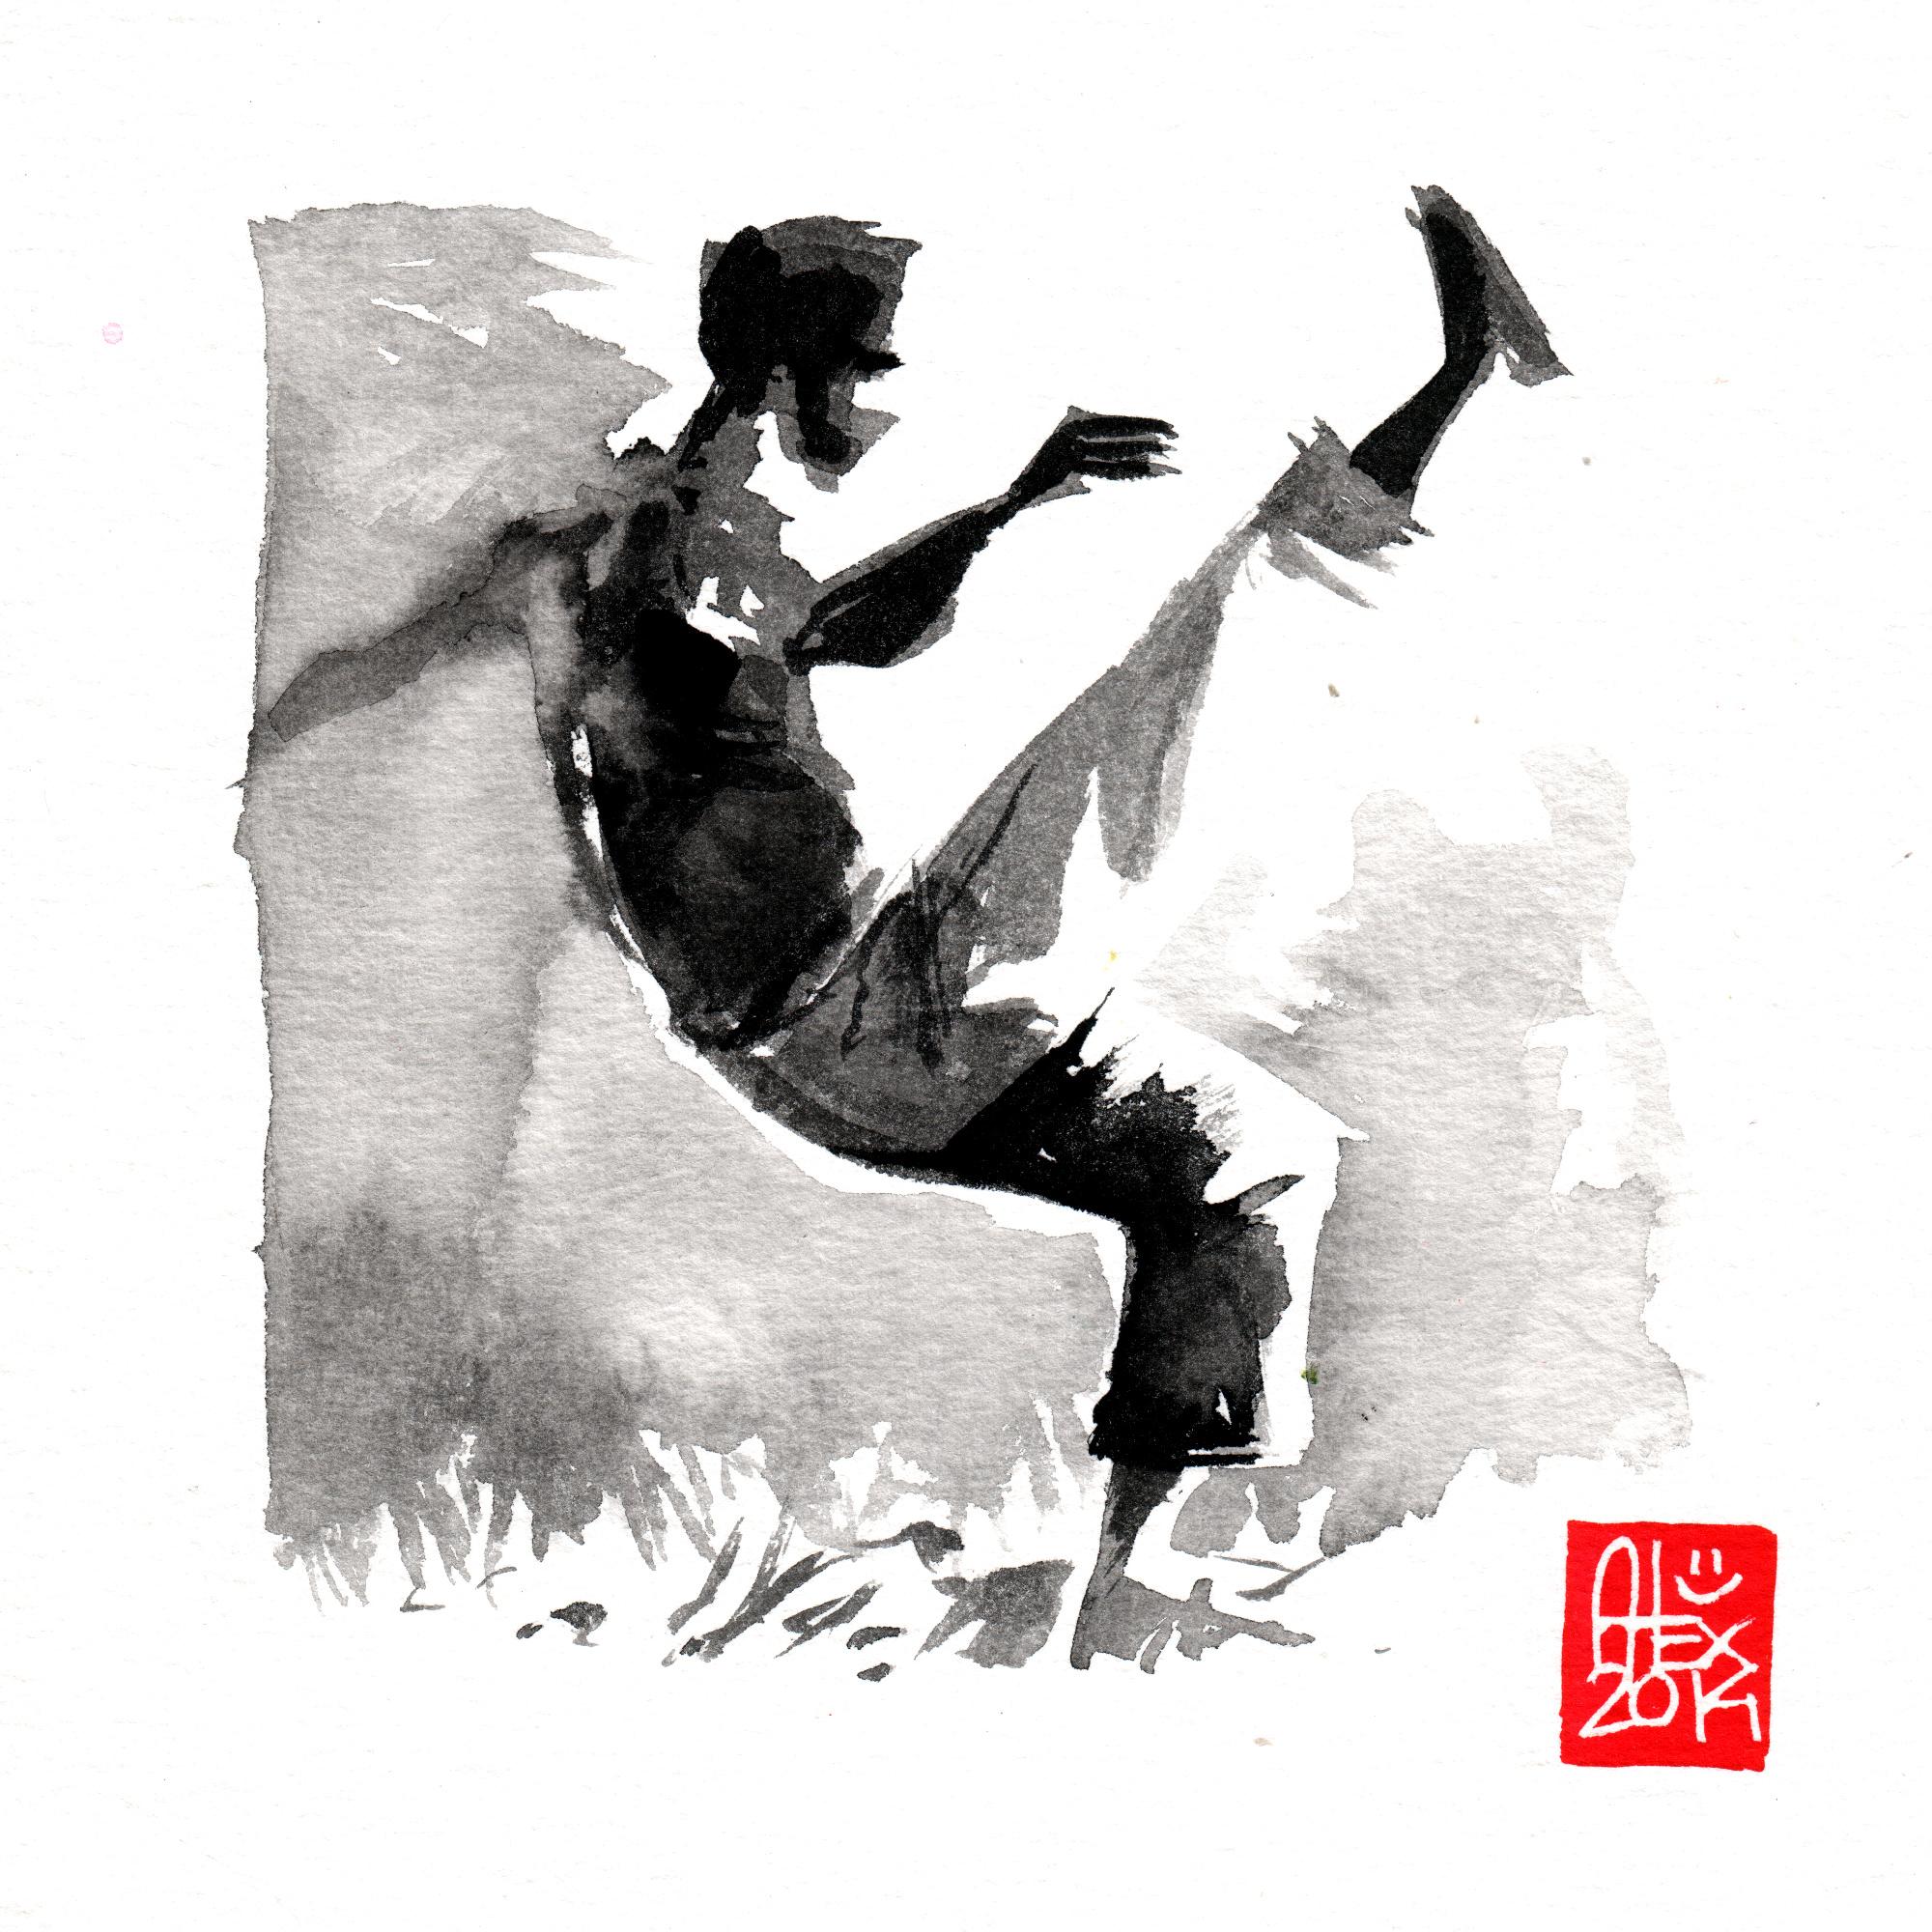 Capoeira 2014 / 2015